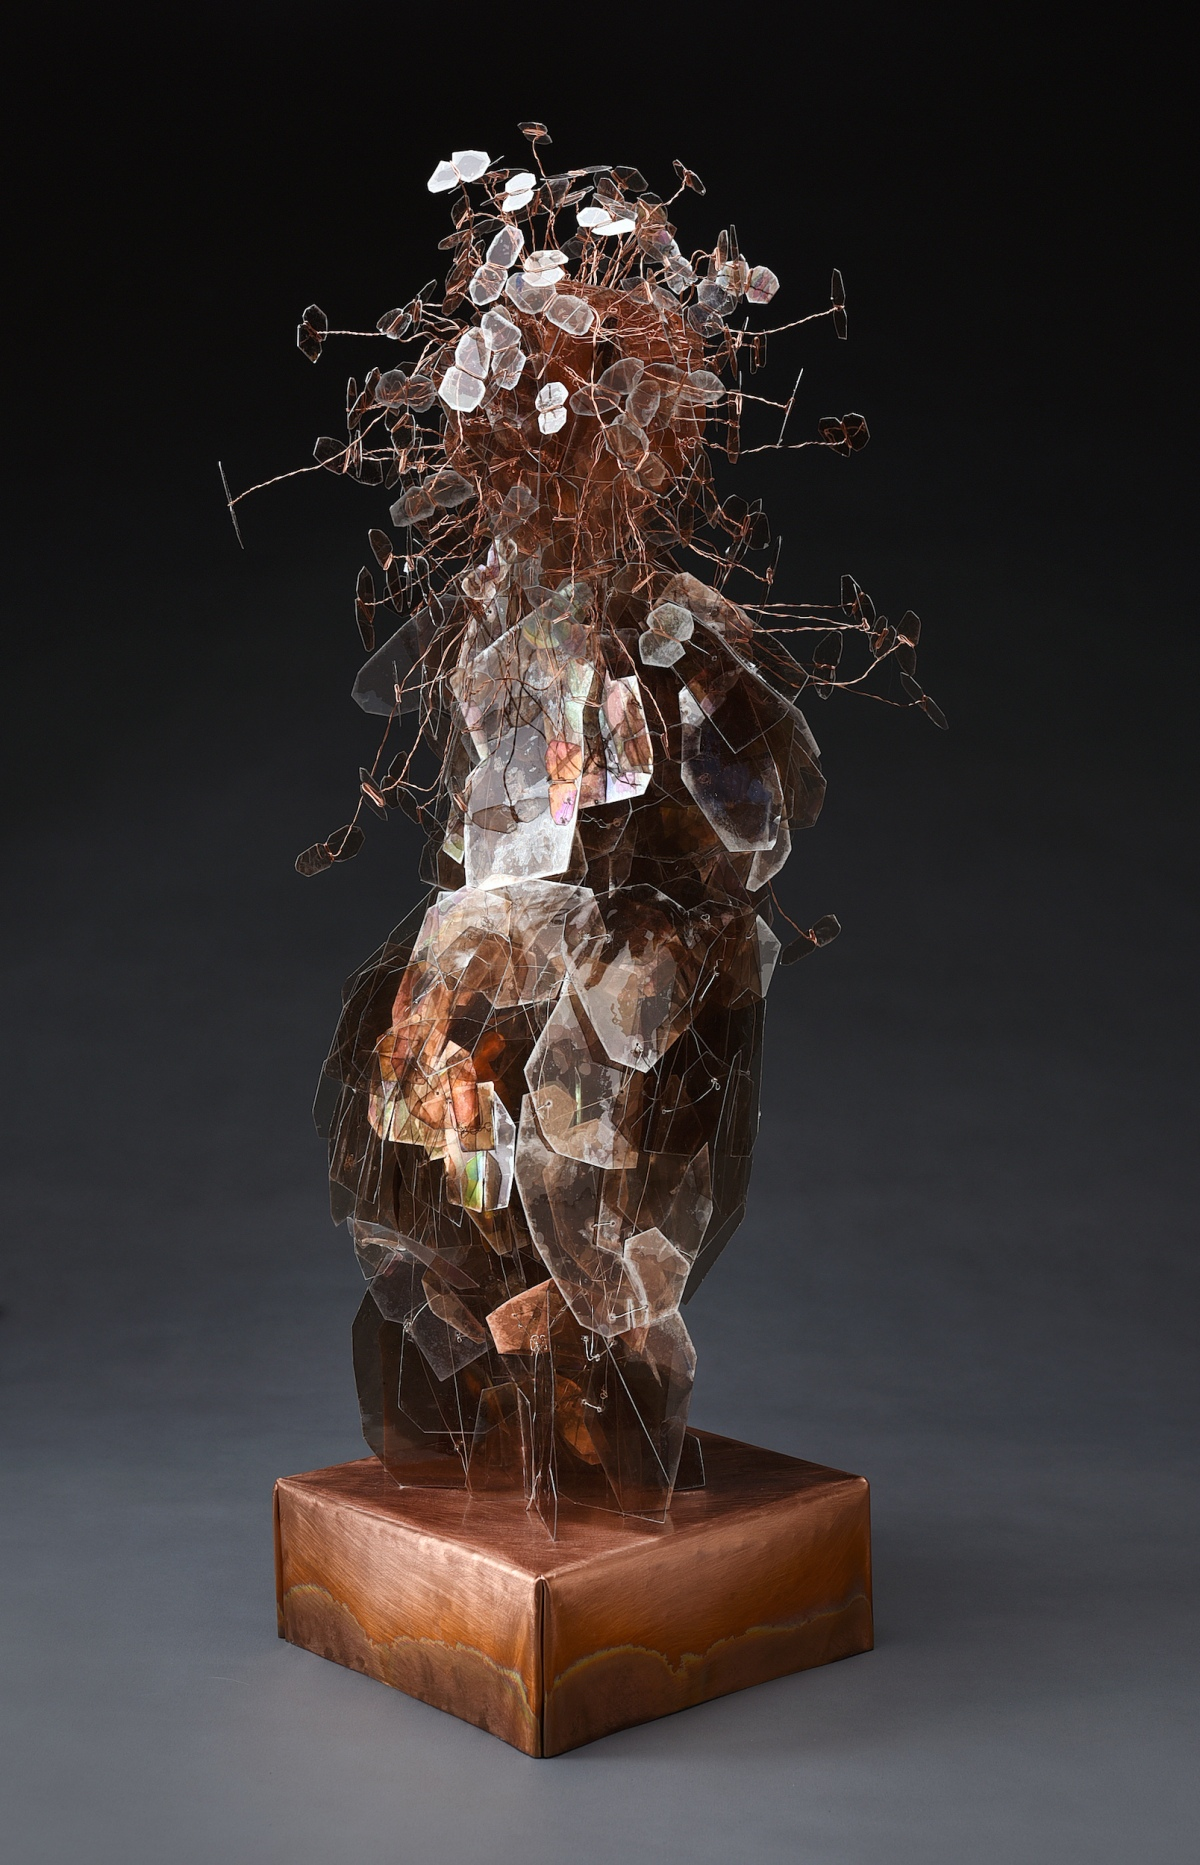 "Eve_s Daughters rear view CEnzHack mica, wire, copper, Swarovski crystal 31x15x15"" 2018 Josh Farr Sm"